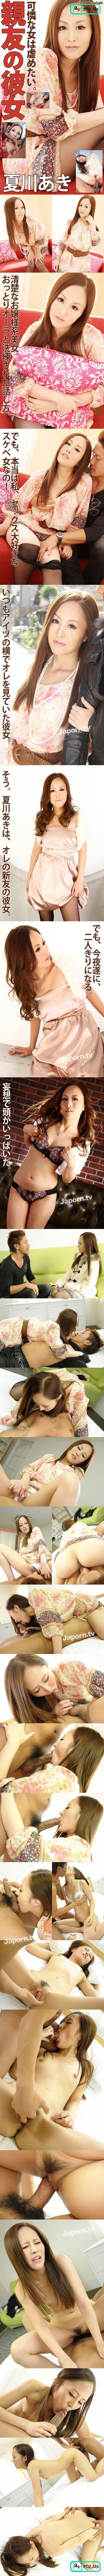 [PT-76] My Best Friend's Girl Friend : Aki Natsukawa - image PT-76a on https://javfree.me